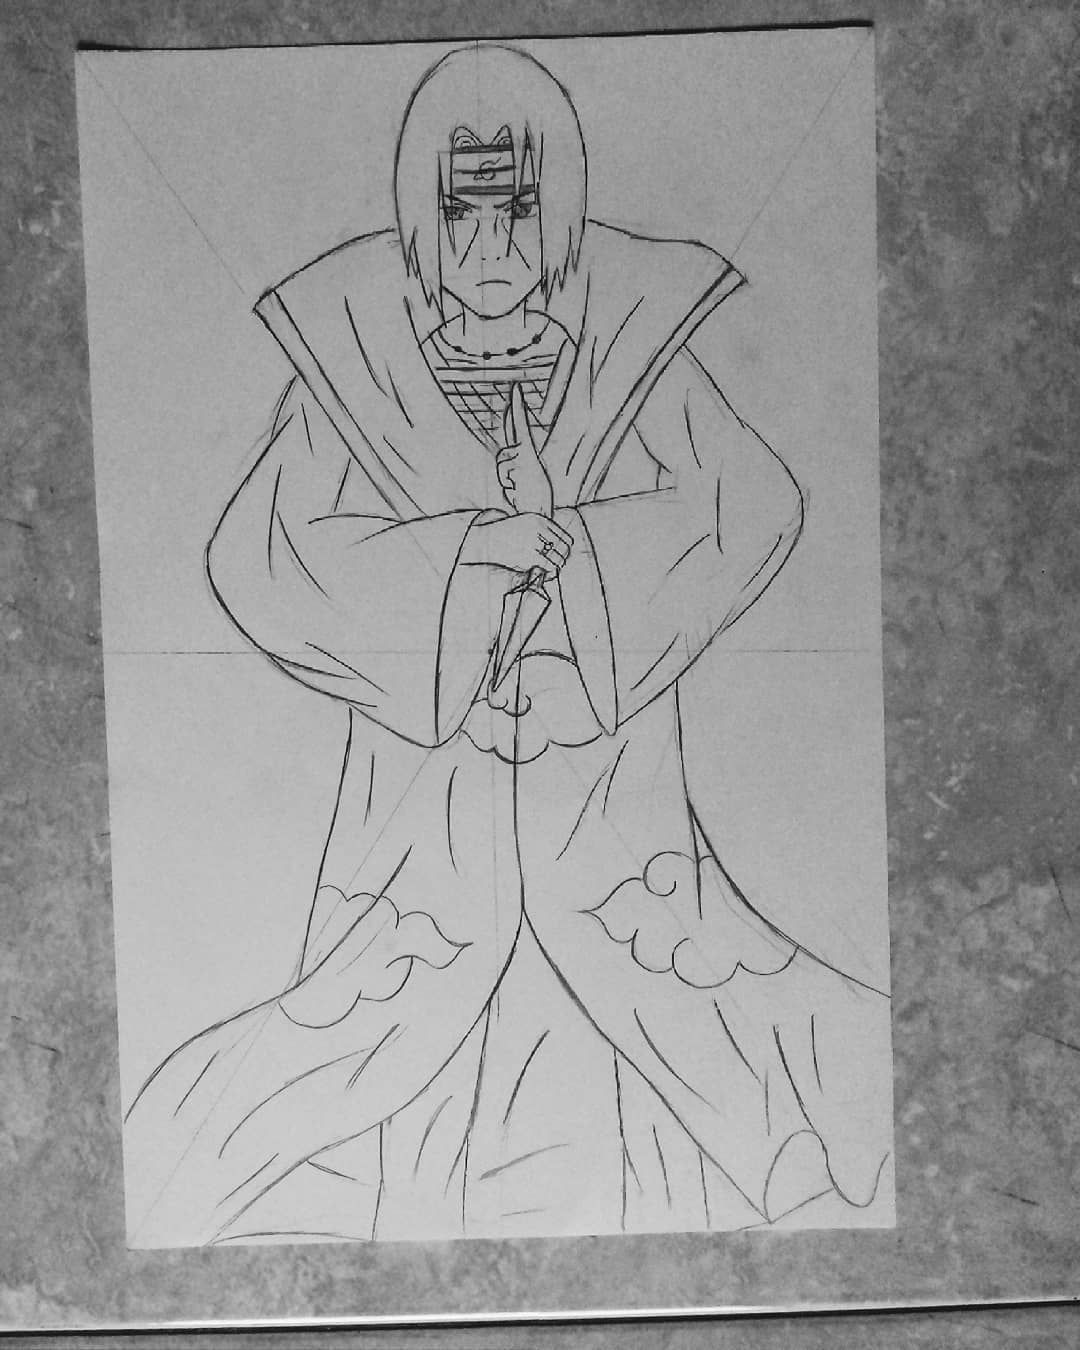 Hendra Di Instagram Uchiha Itachi Royalepost Art Artwork Pencilcase Pencilart Pencildrawing Pencil Colour Drawin Anime Drawings Male Sketch Drawings